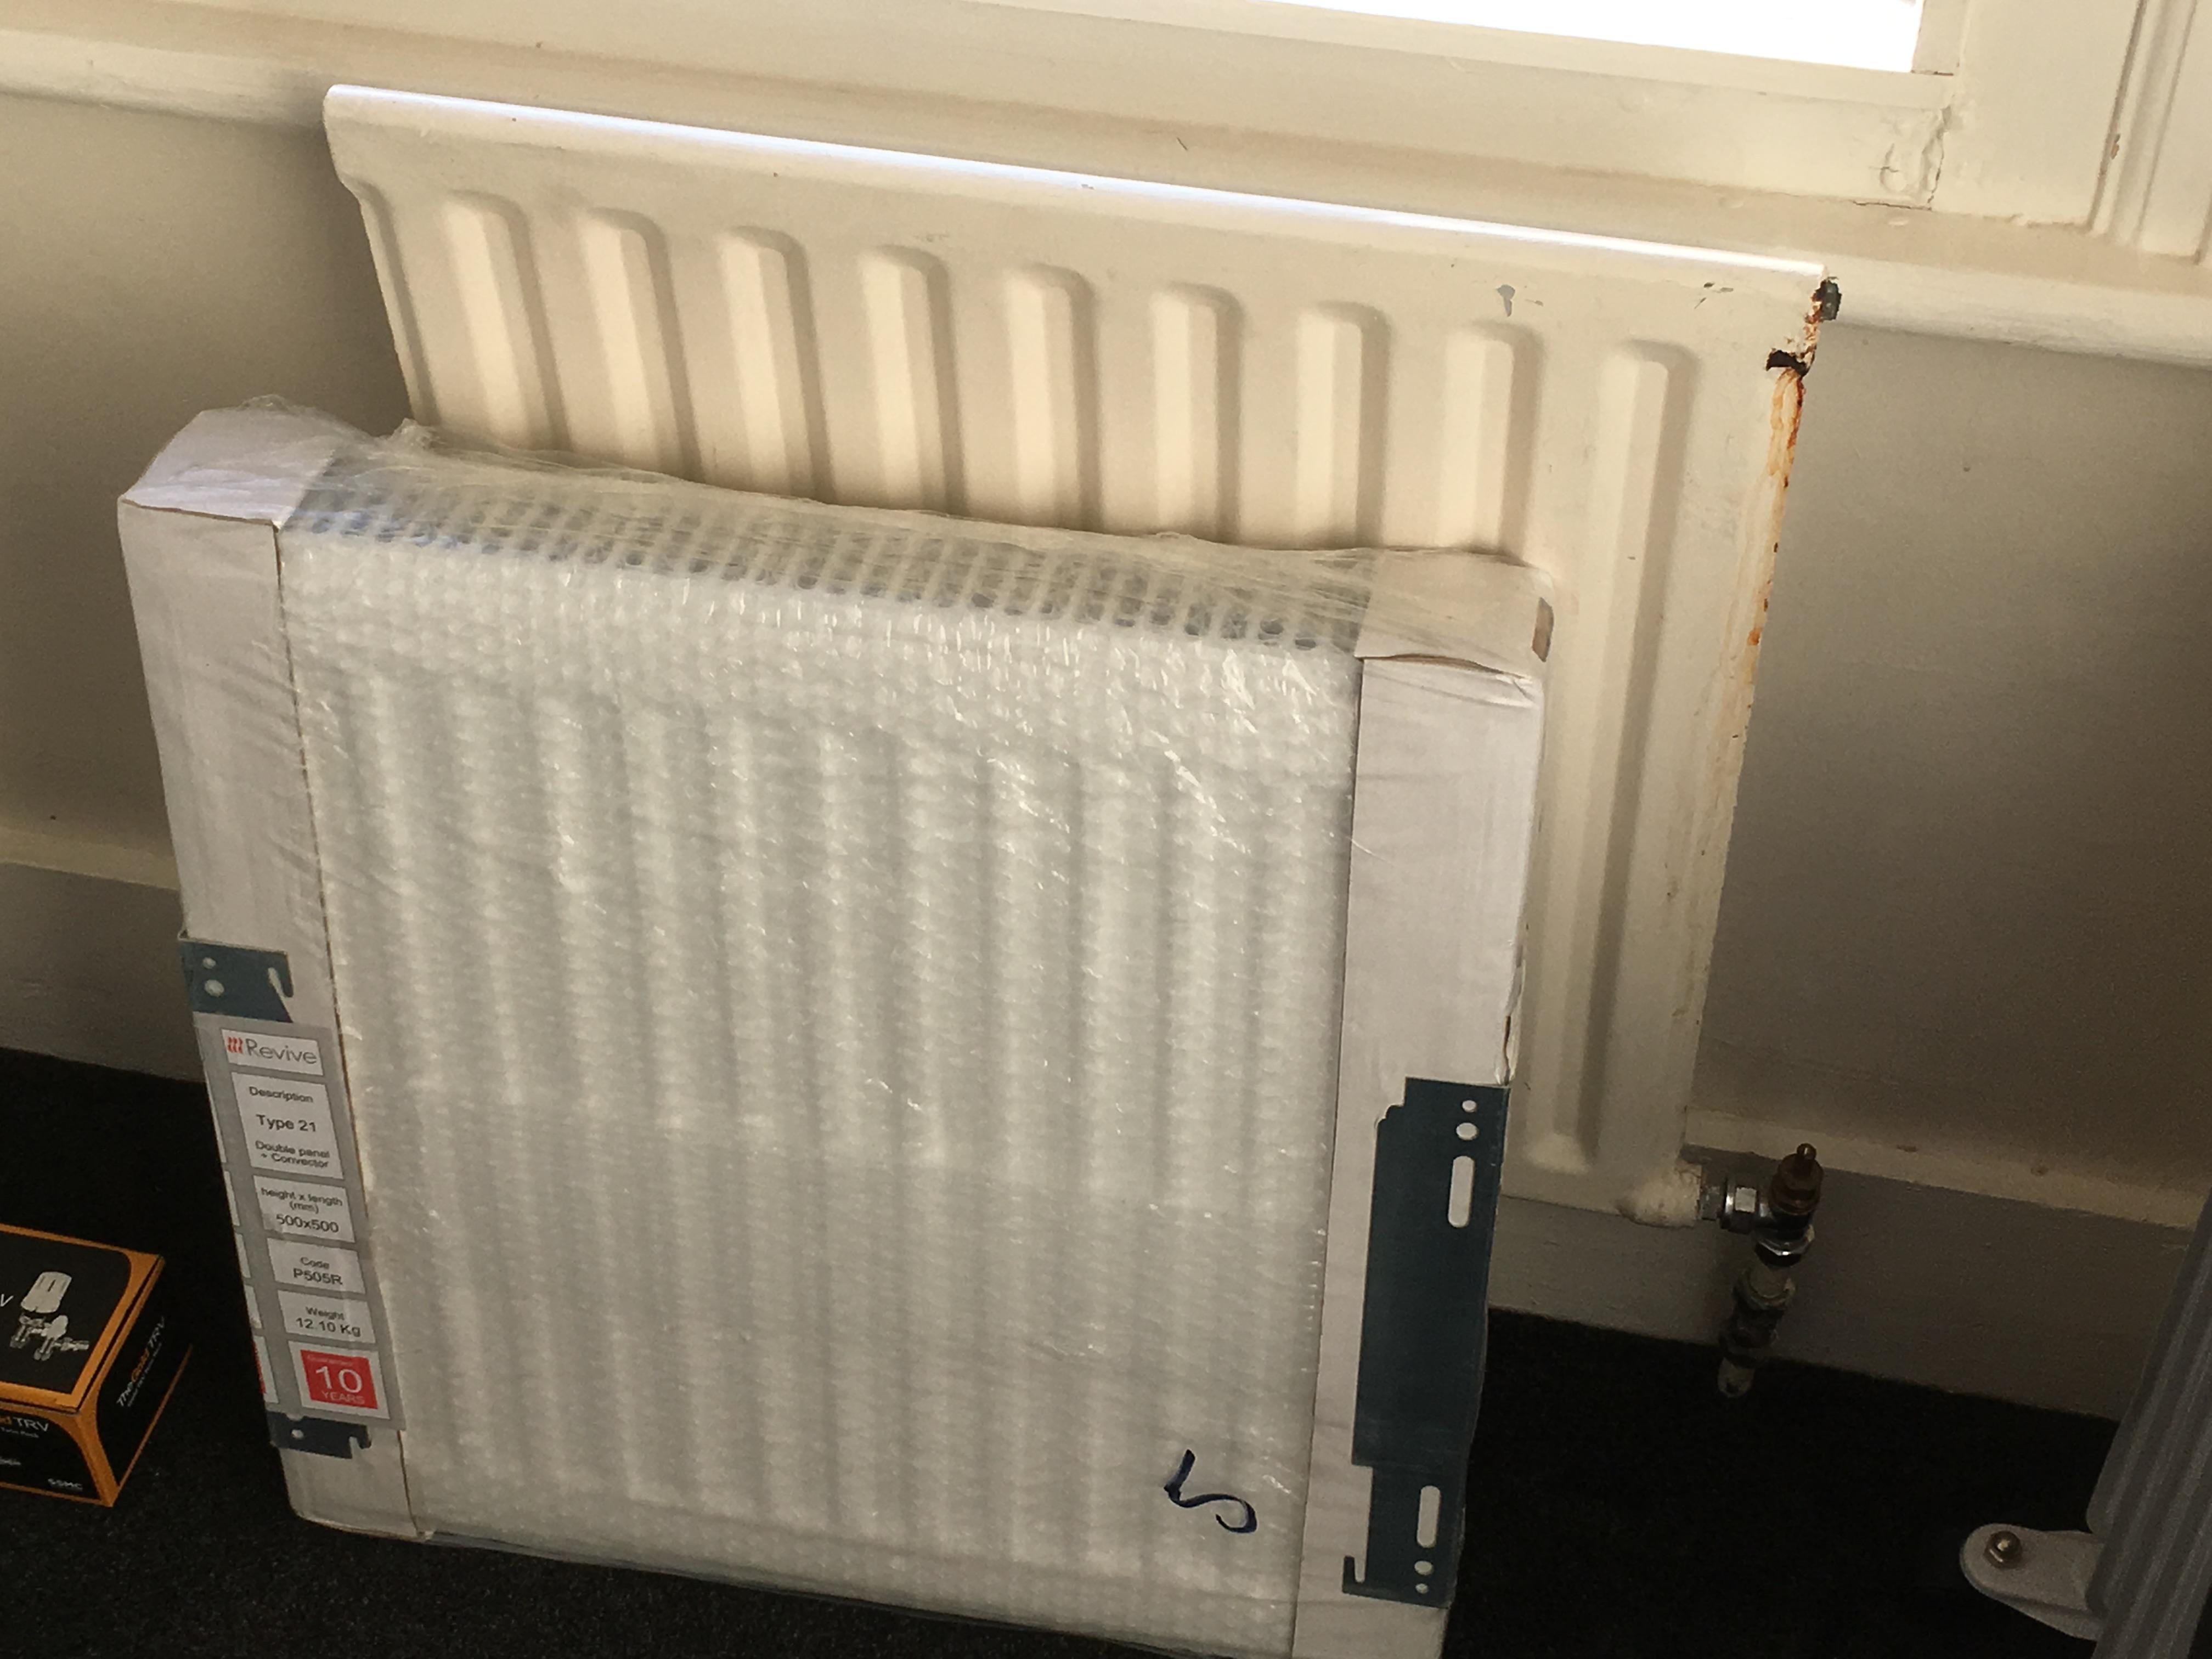 radiator installation twickenham 5 switchmaster sm300 wiring diagram switchmaster 300 timer manual switchmaster sm805 wiring diagram at soozxer.org